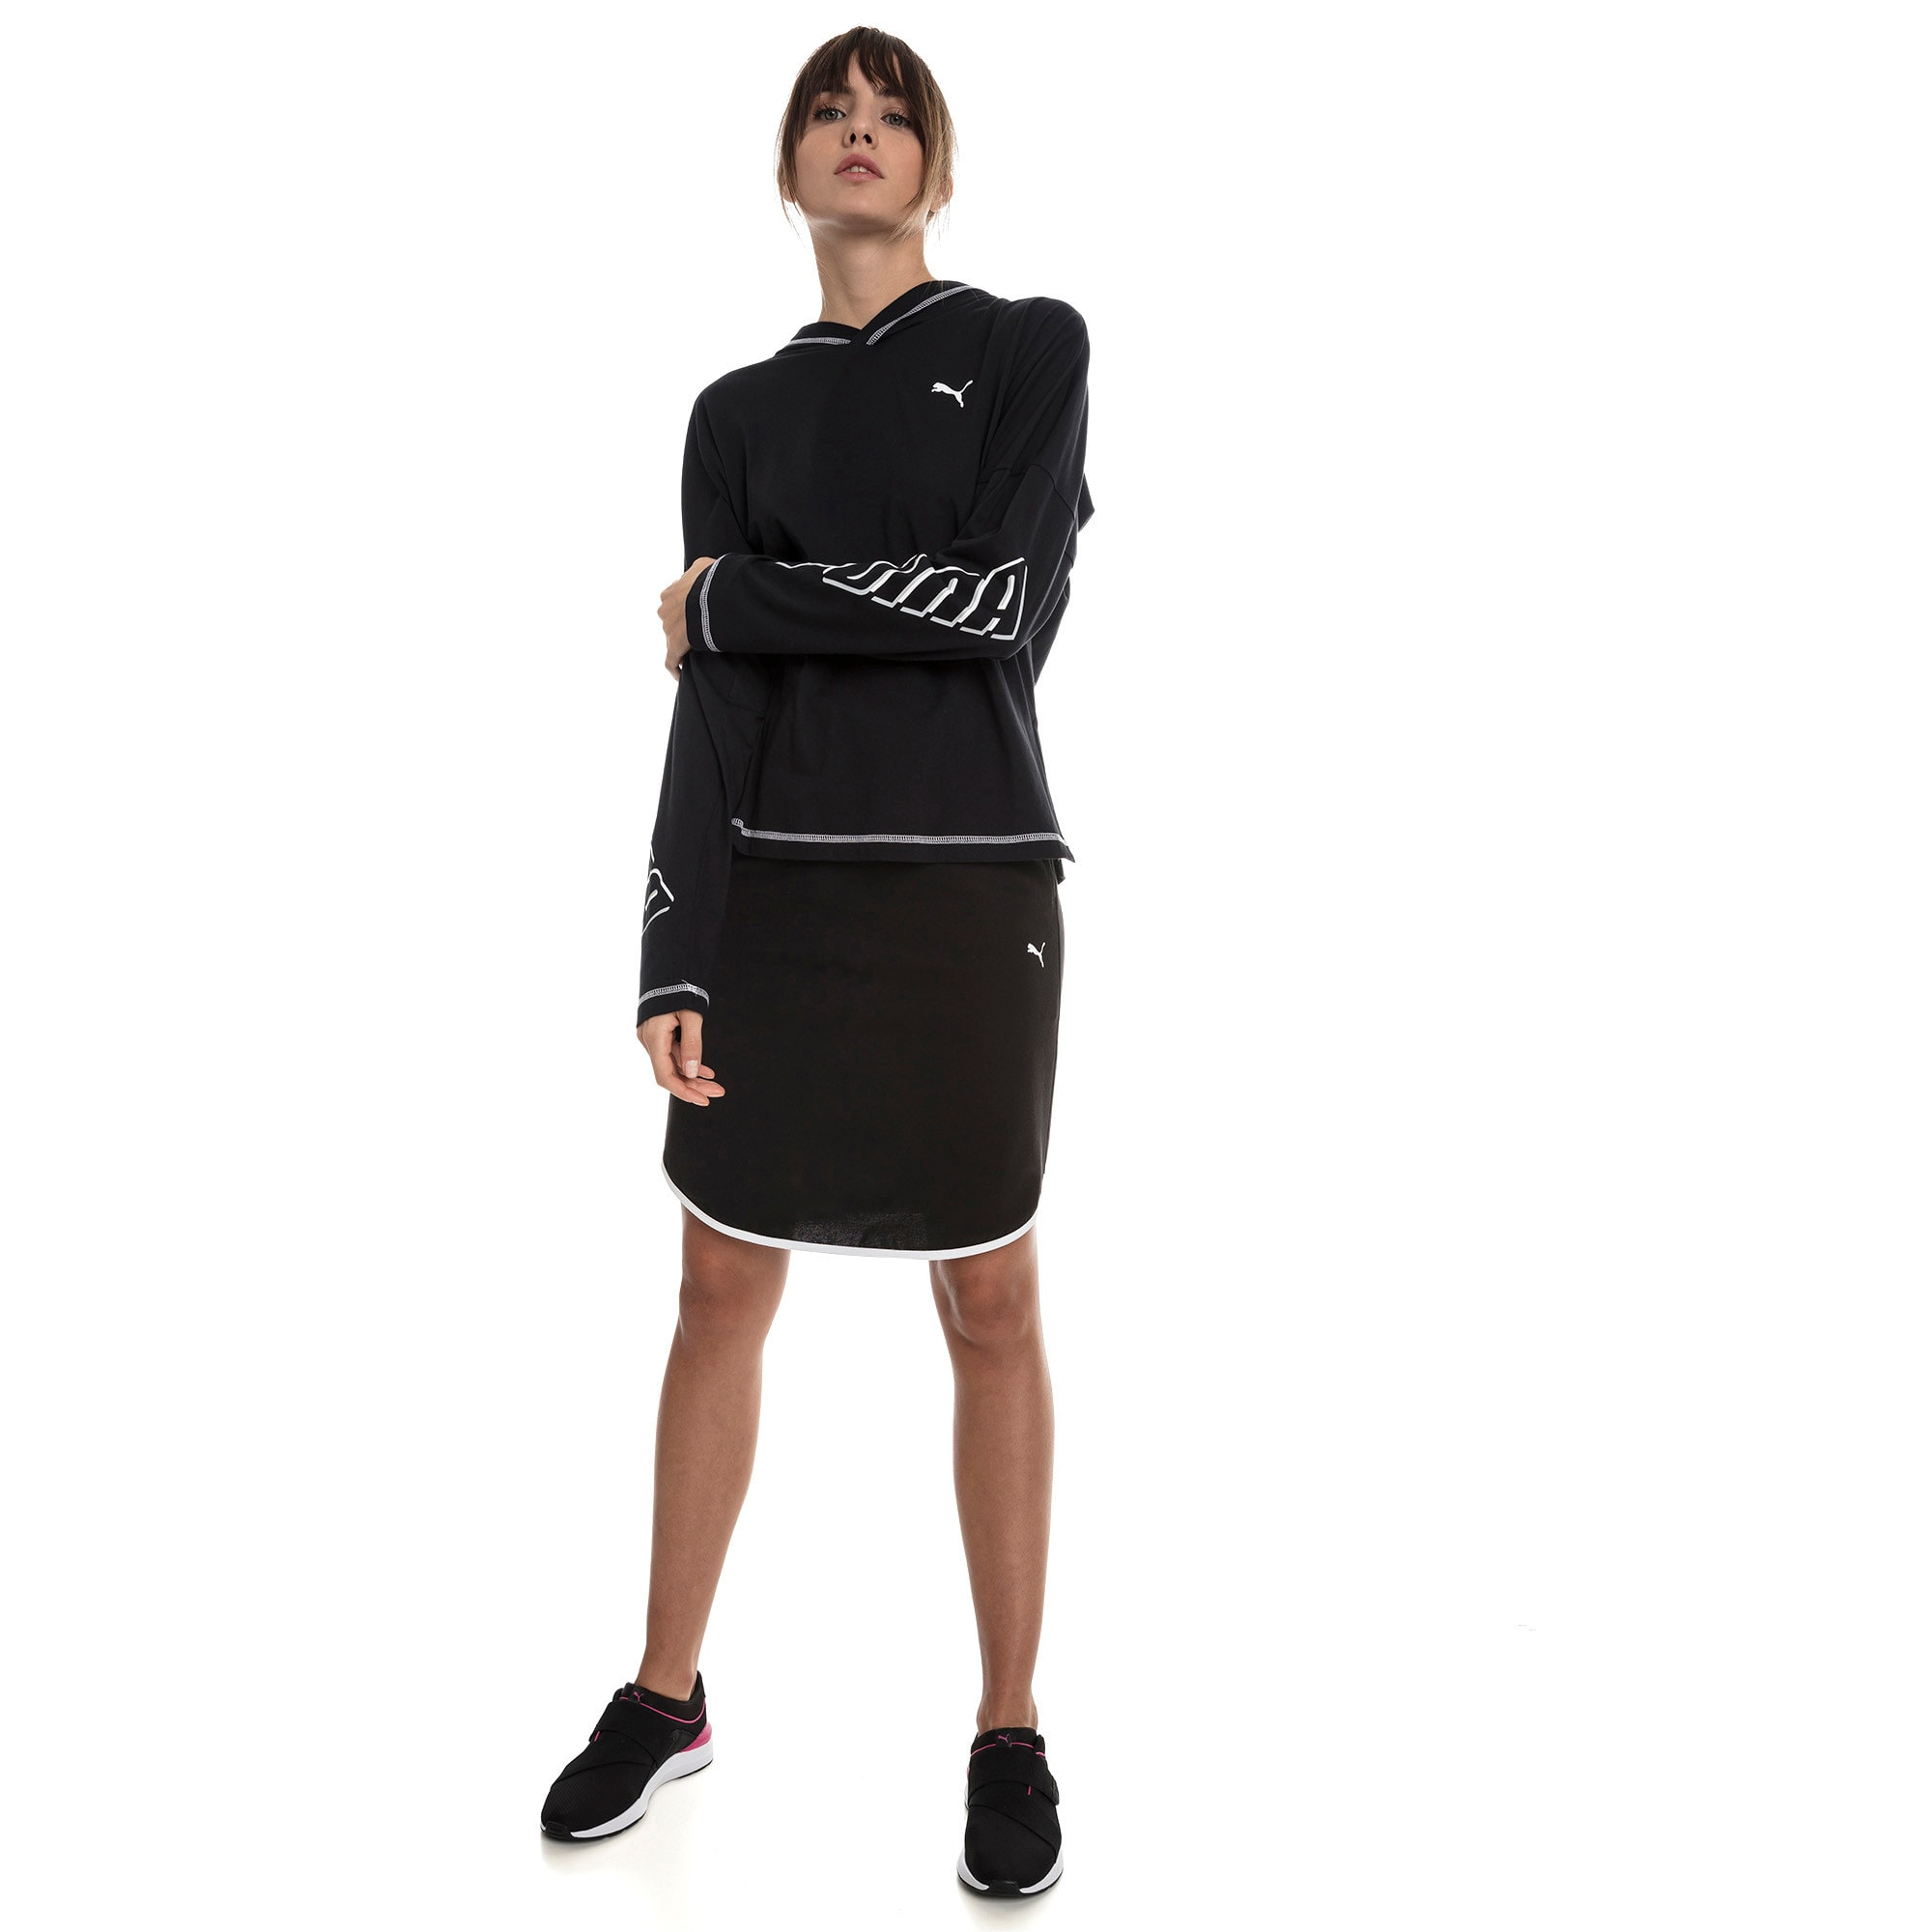 Miniatura 3 de Top liviano Modern Sports para mujer, Cotton Black, mediano